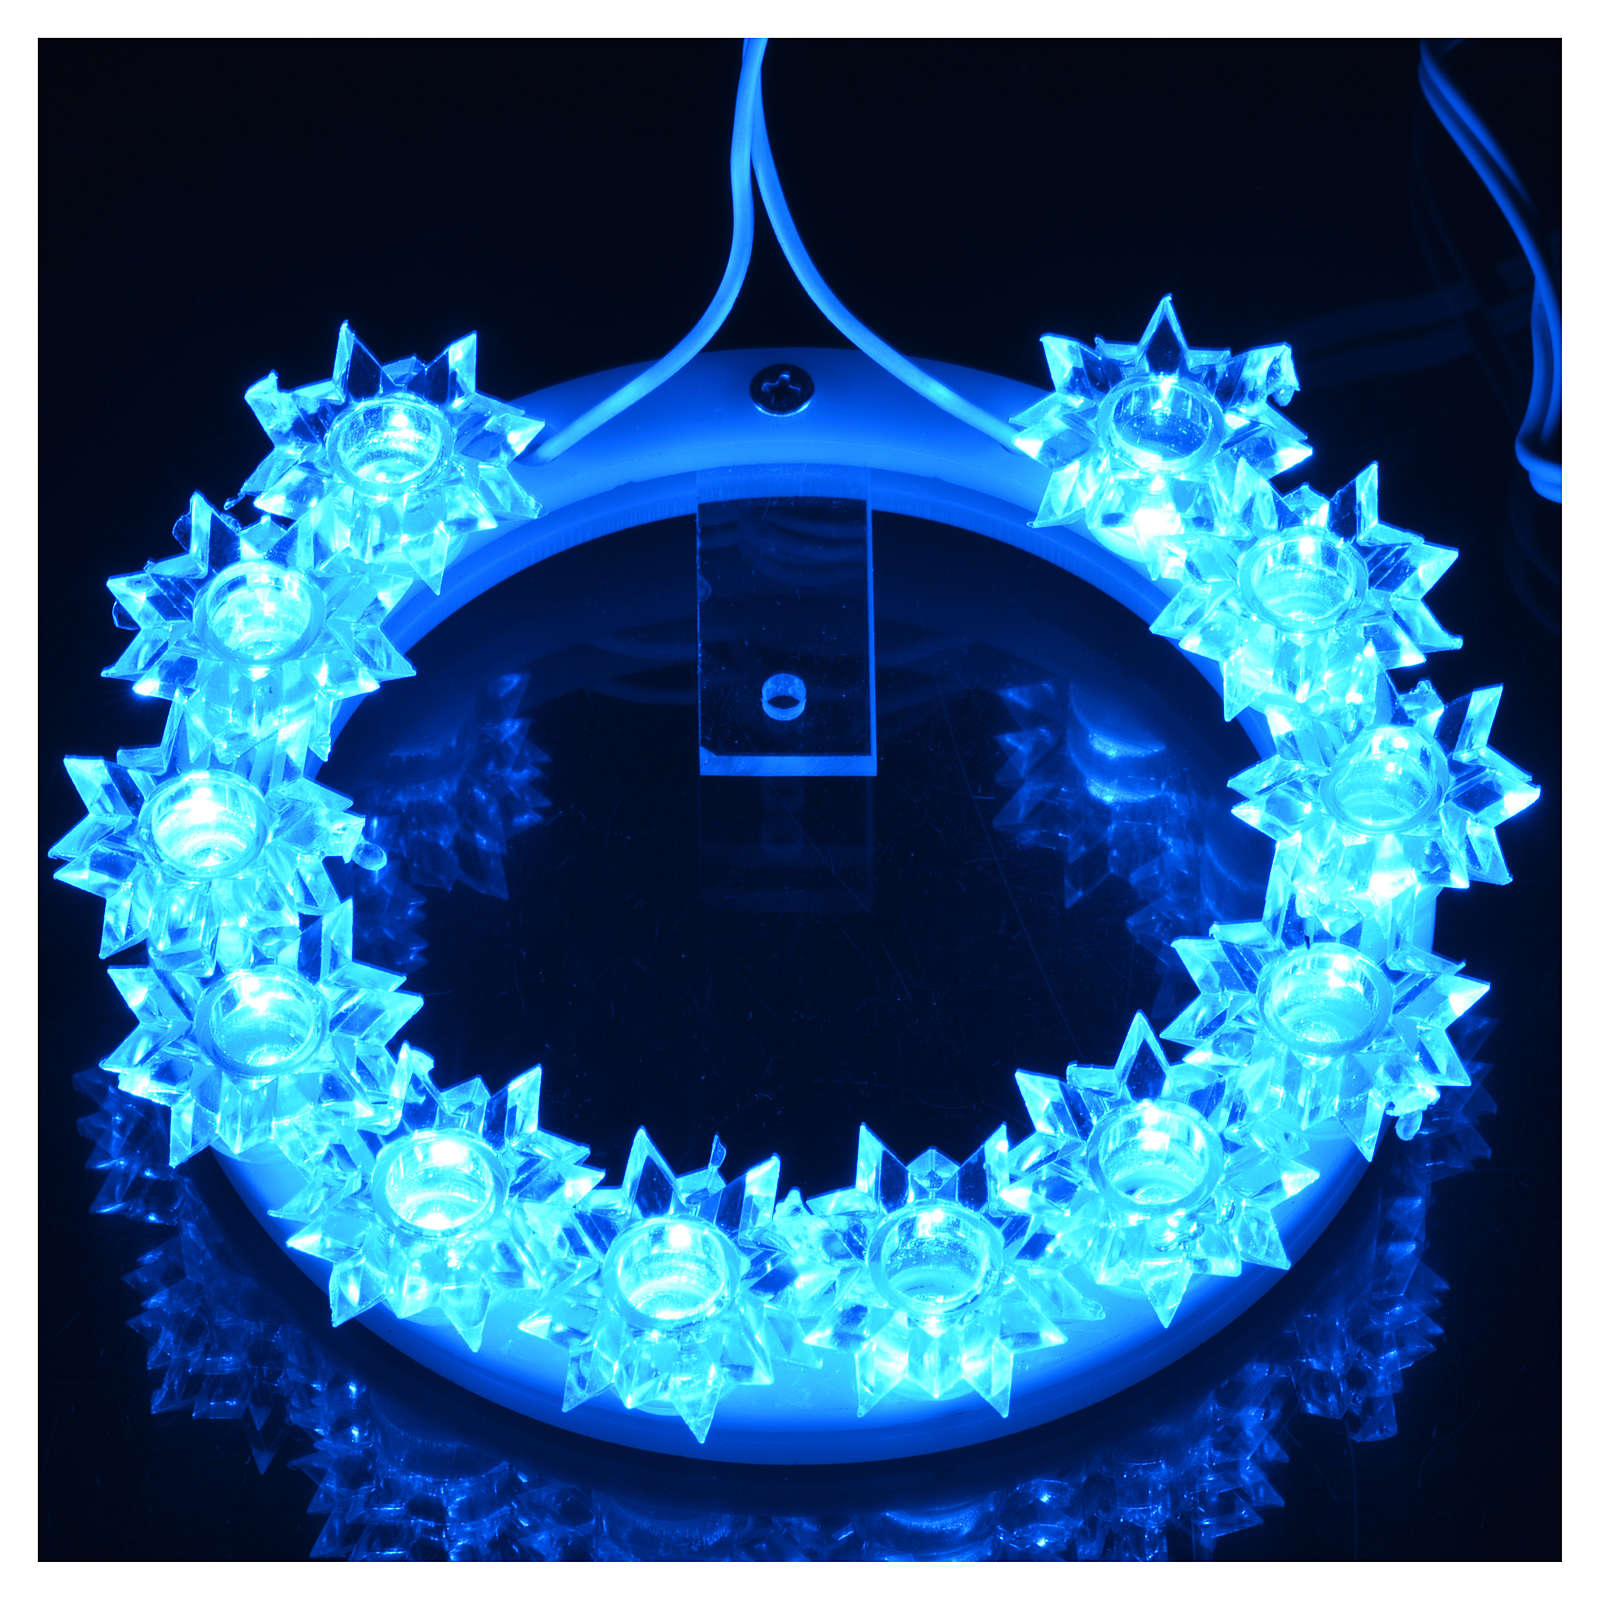 Plexiglas luminous halo with flowers and light blue LED 3